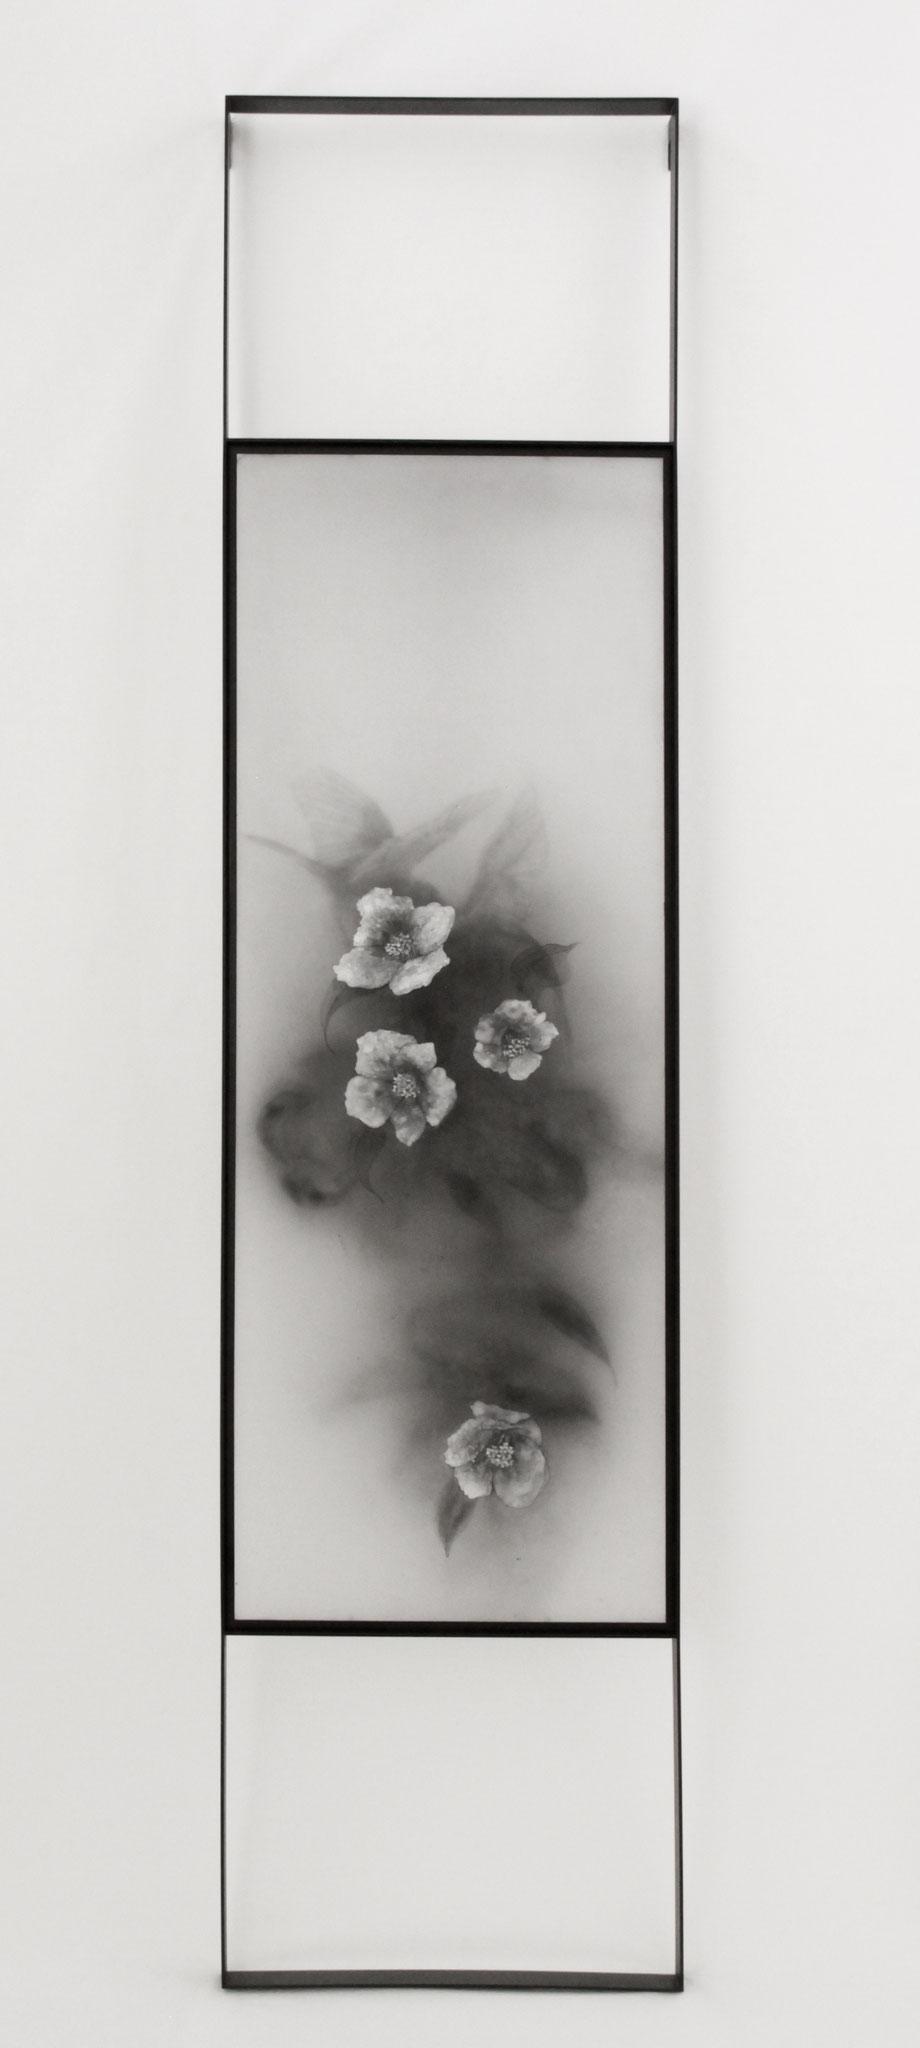 TSUBAKI#2, 2016/ 151.2cm×36.3cm×5cm/ Kiln cast, painted, Japanese Ink, Metal frame